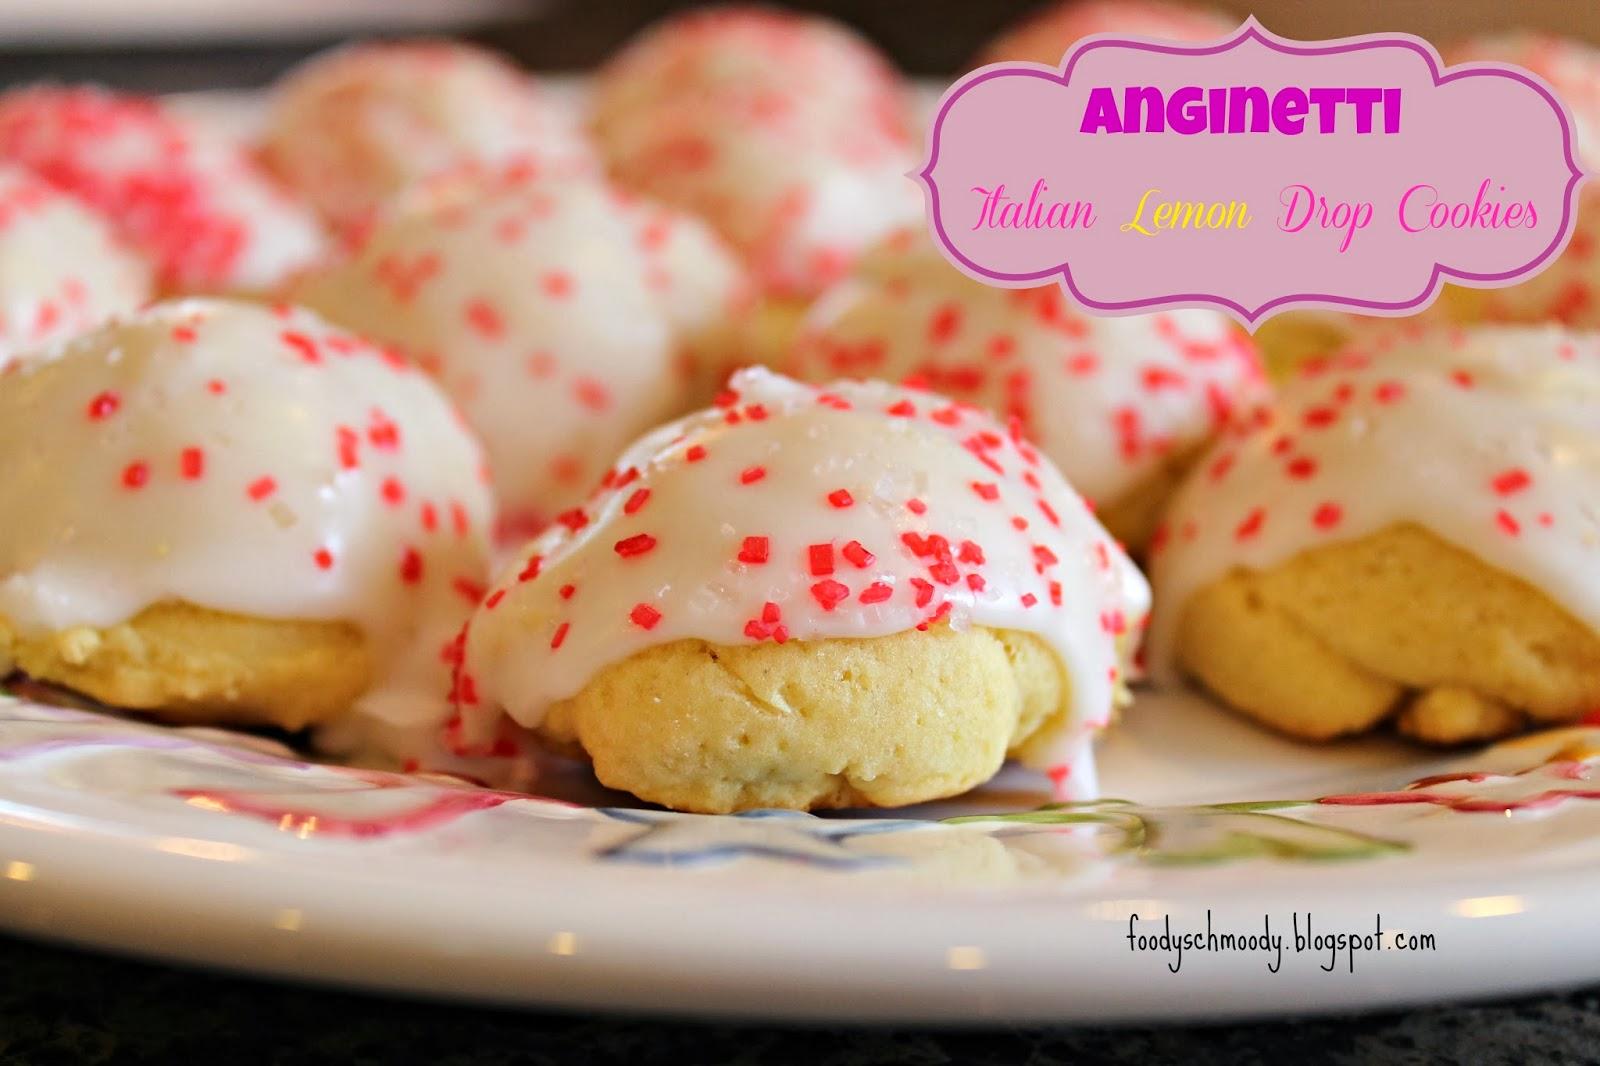 Anginetti (lemon drop cookies)